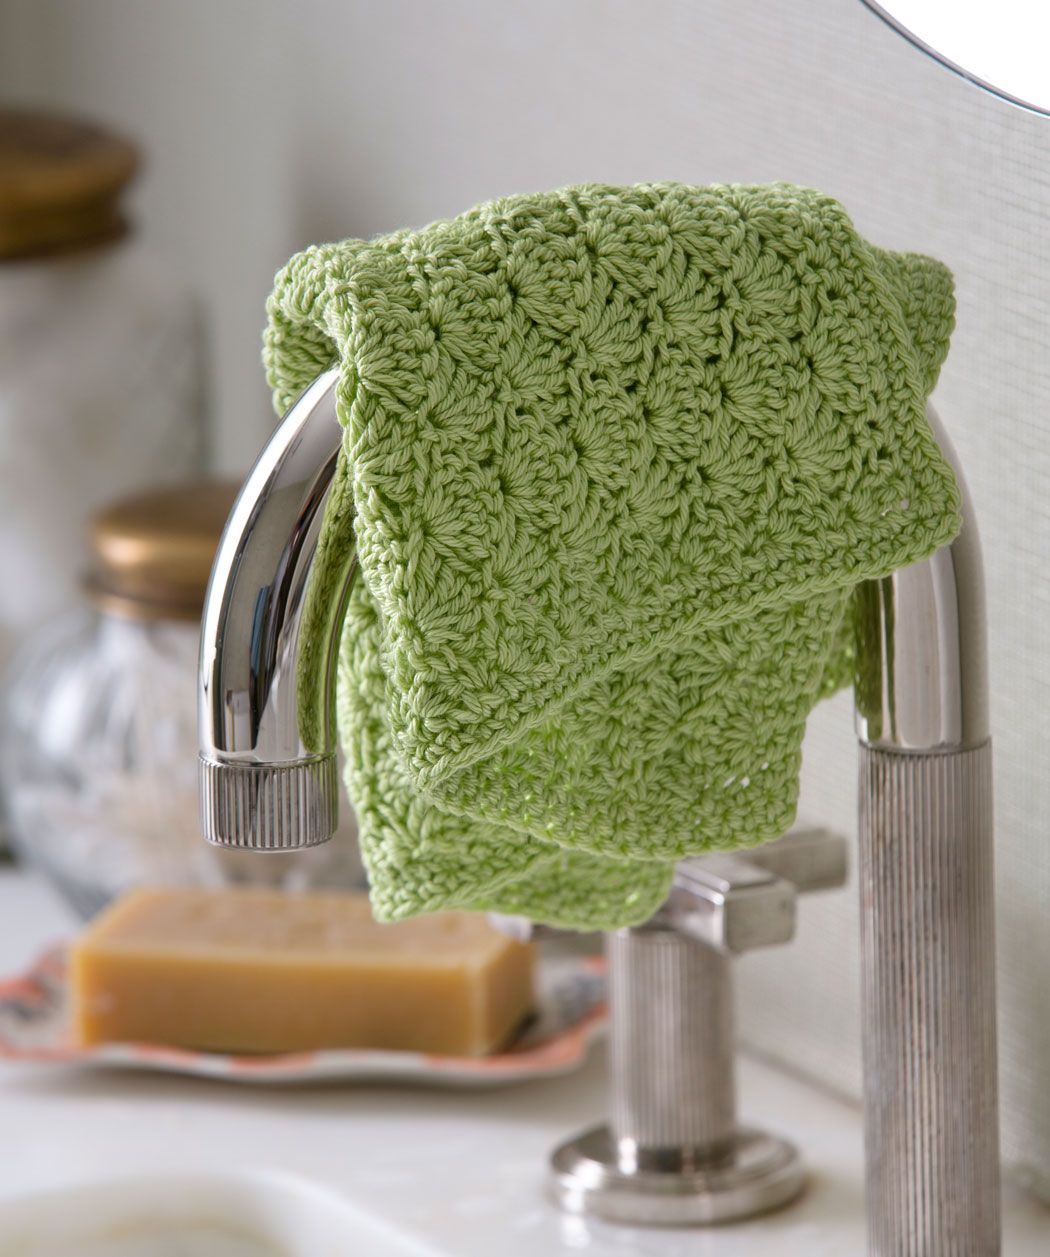 Shell Stitch Washcloth Free Crochet Pattern from Red Heart Yarns ...